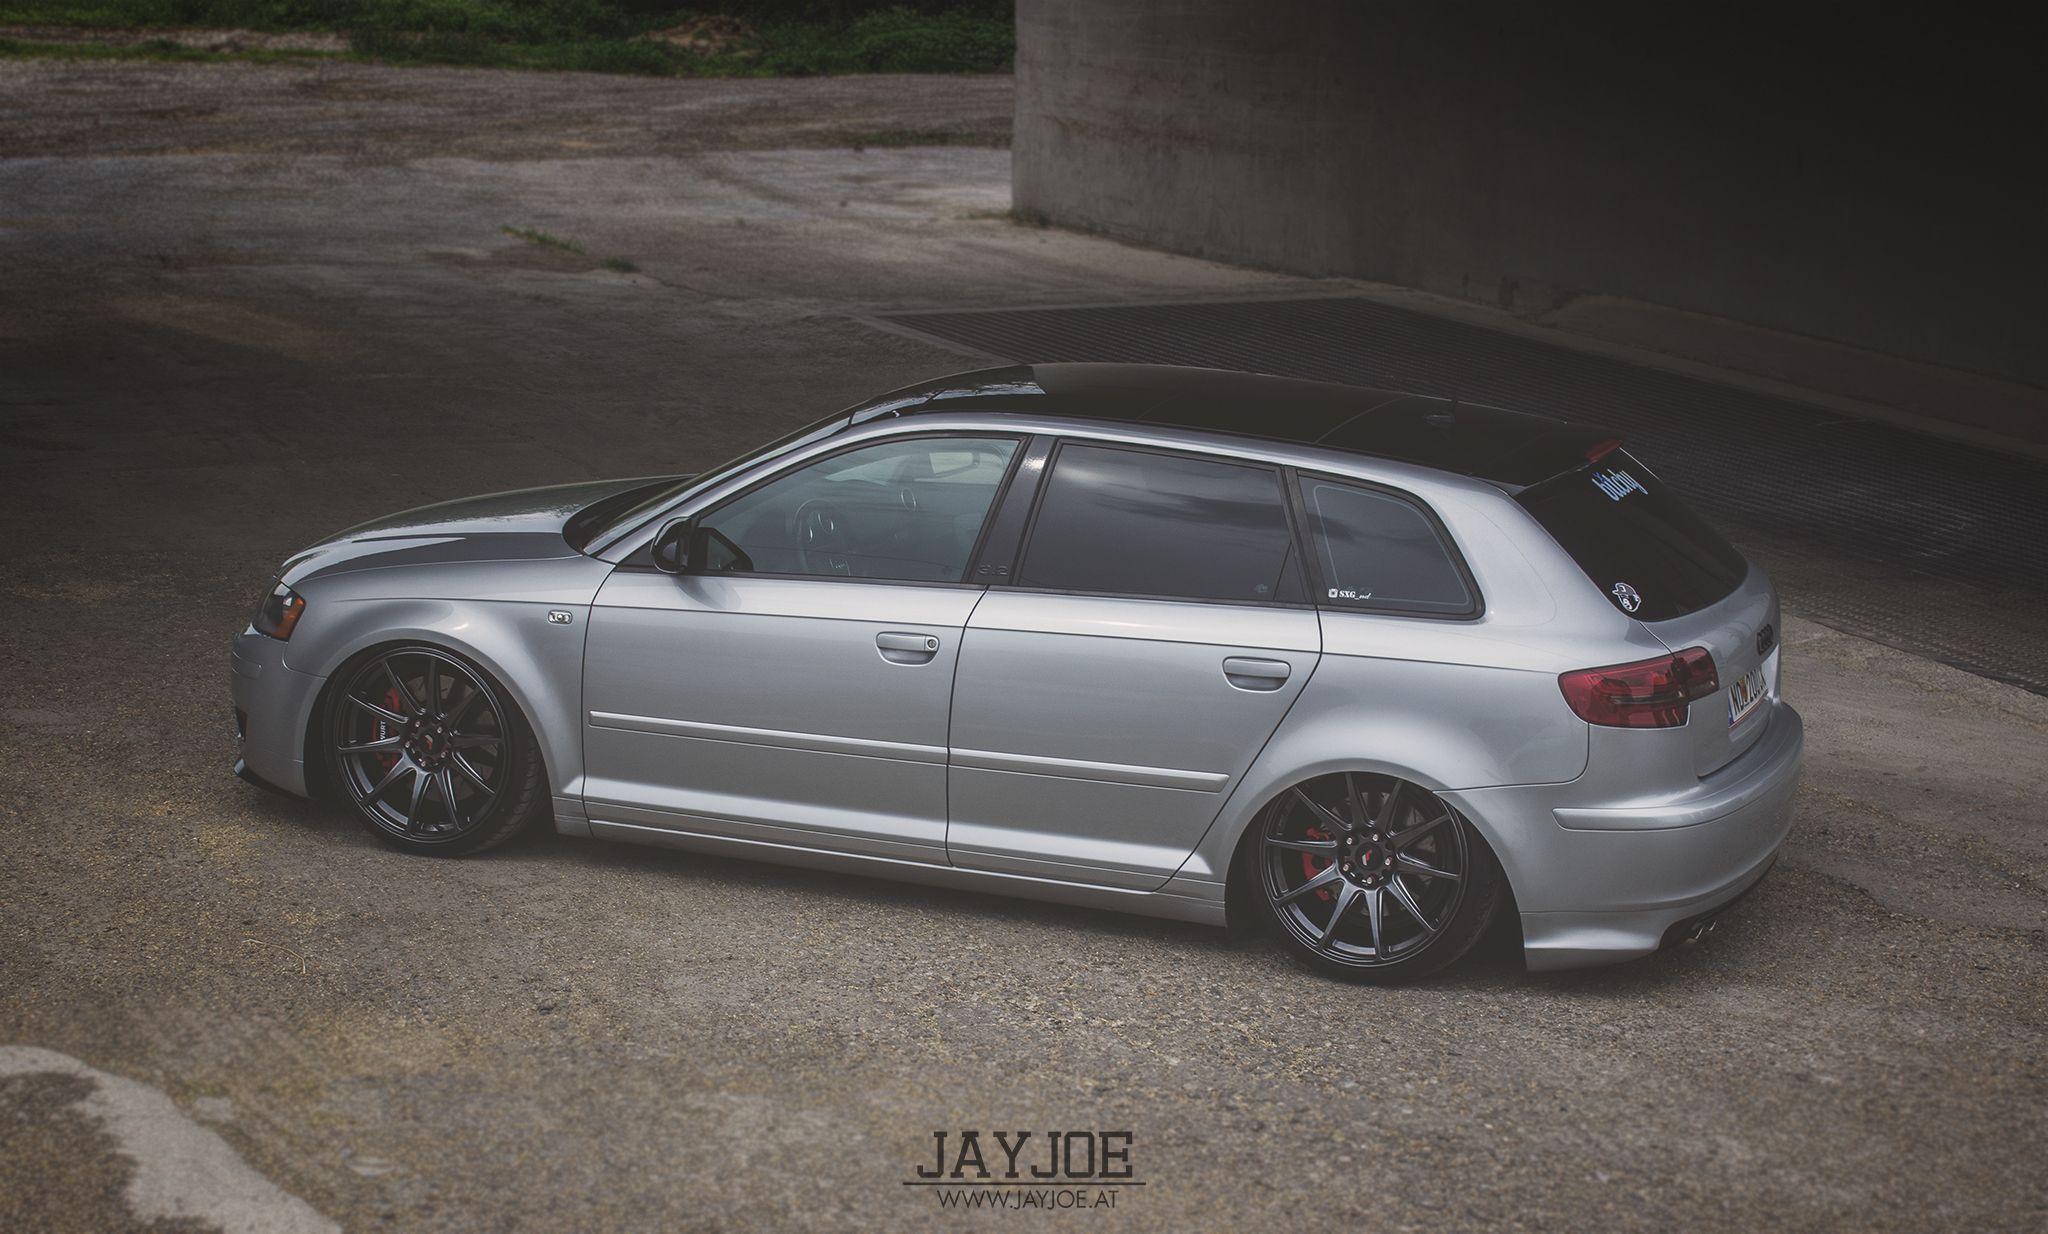 Audi A3 Sportback Www Jayjoe At Memy